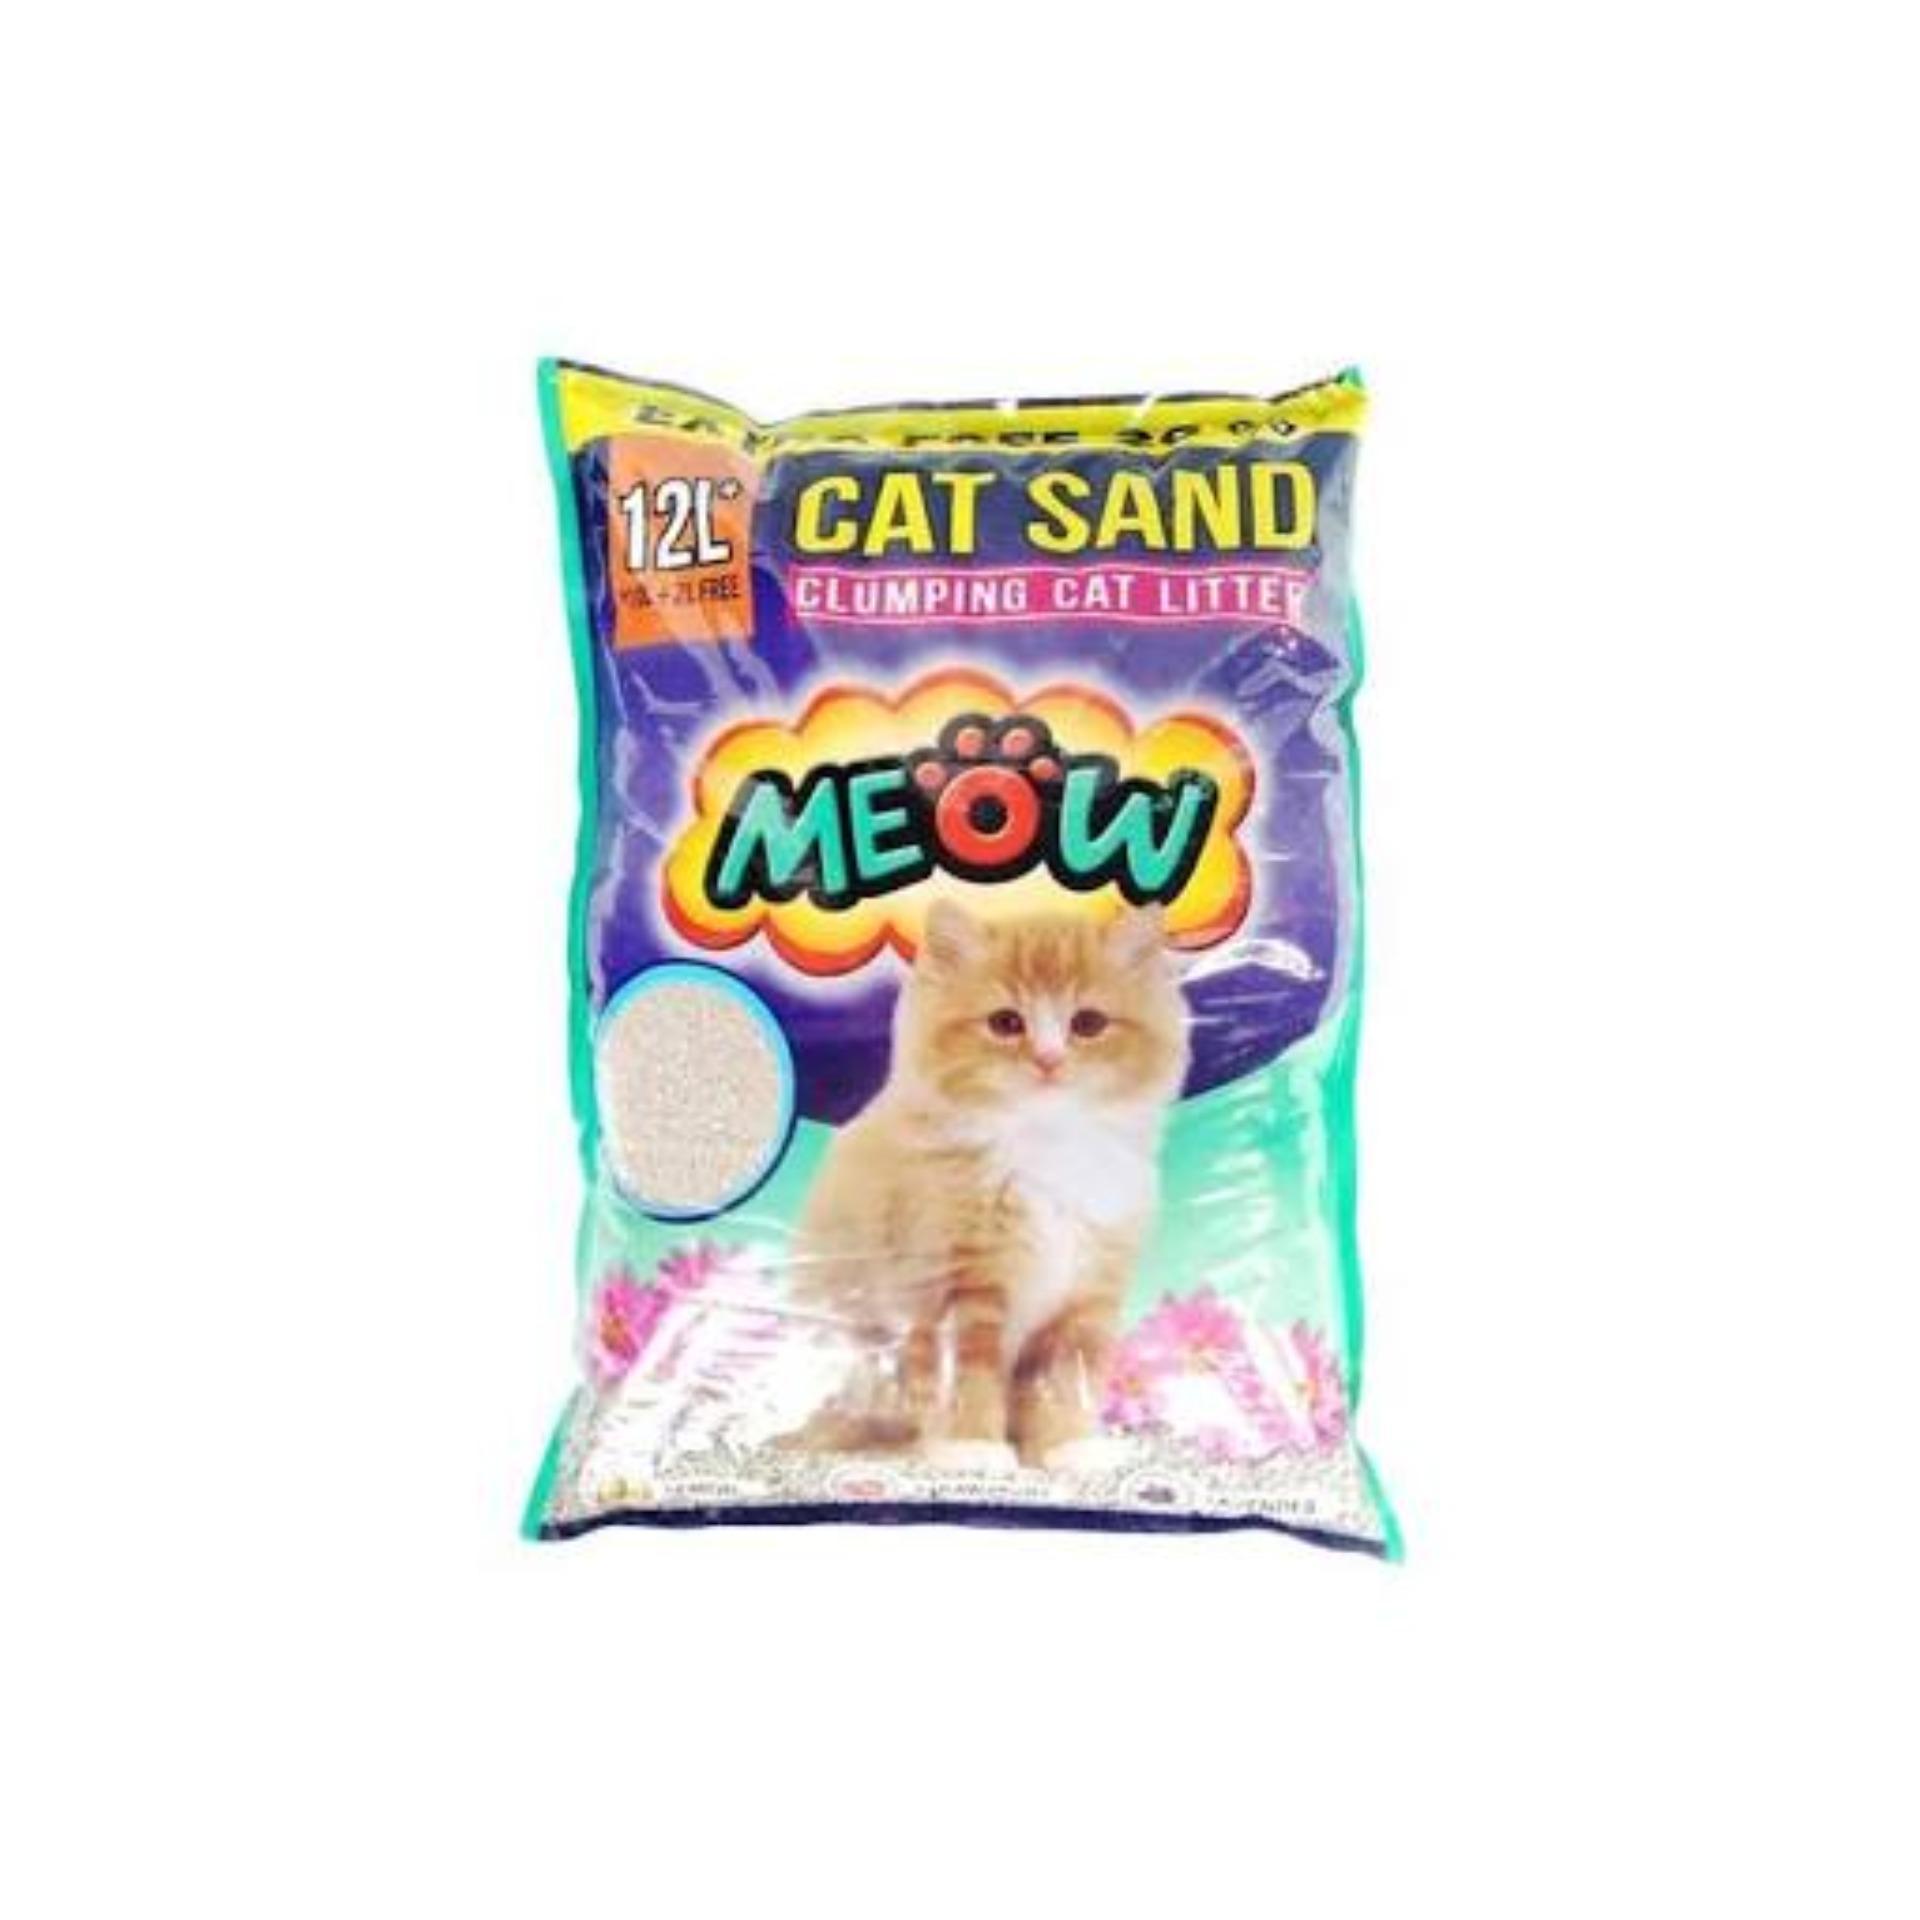 Spesifikasi Pasir Wangi Kucing Gumpal Meow 12 Liter Terbaik